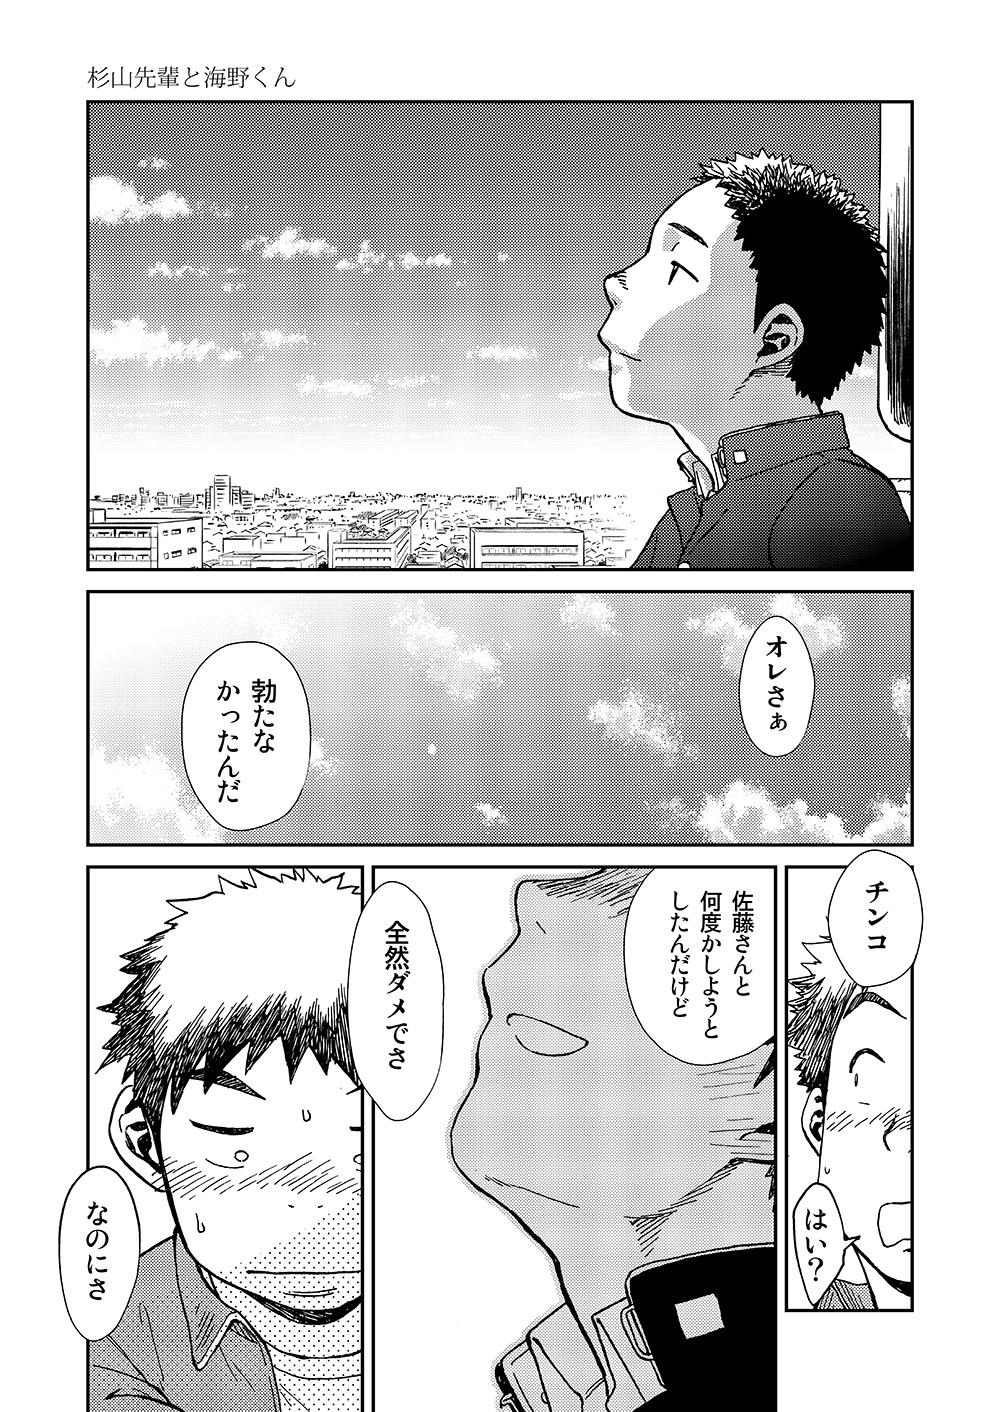 Manga Shounen Zoom Vol. 10 14